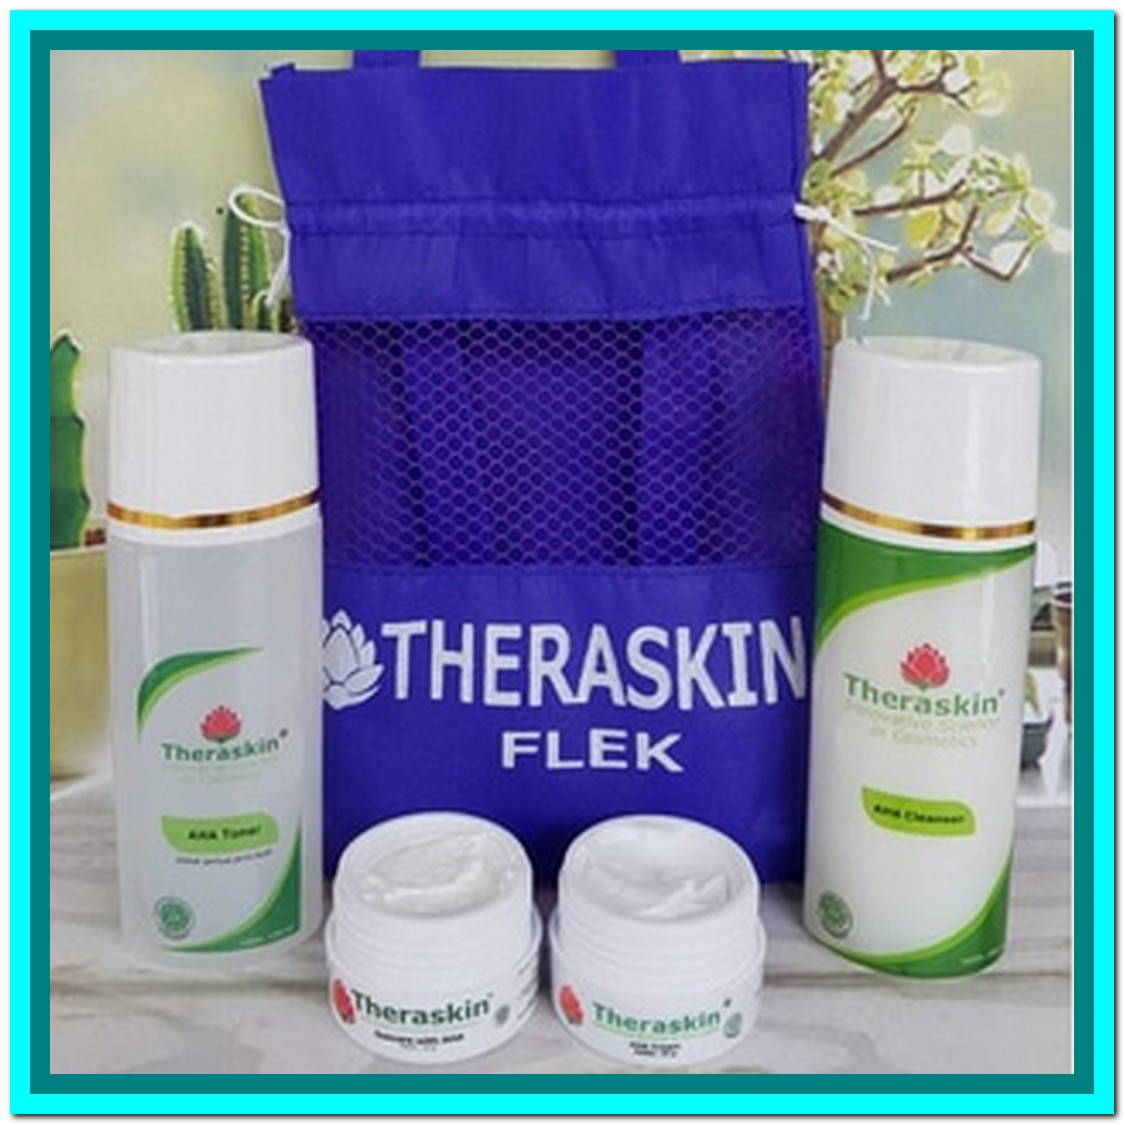 Paket Flek Theraskin Original Bpom